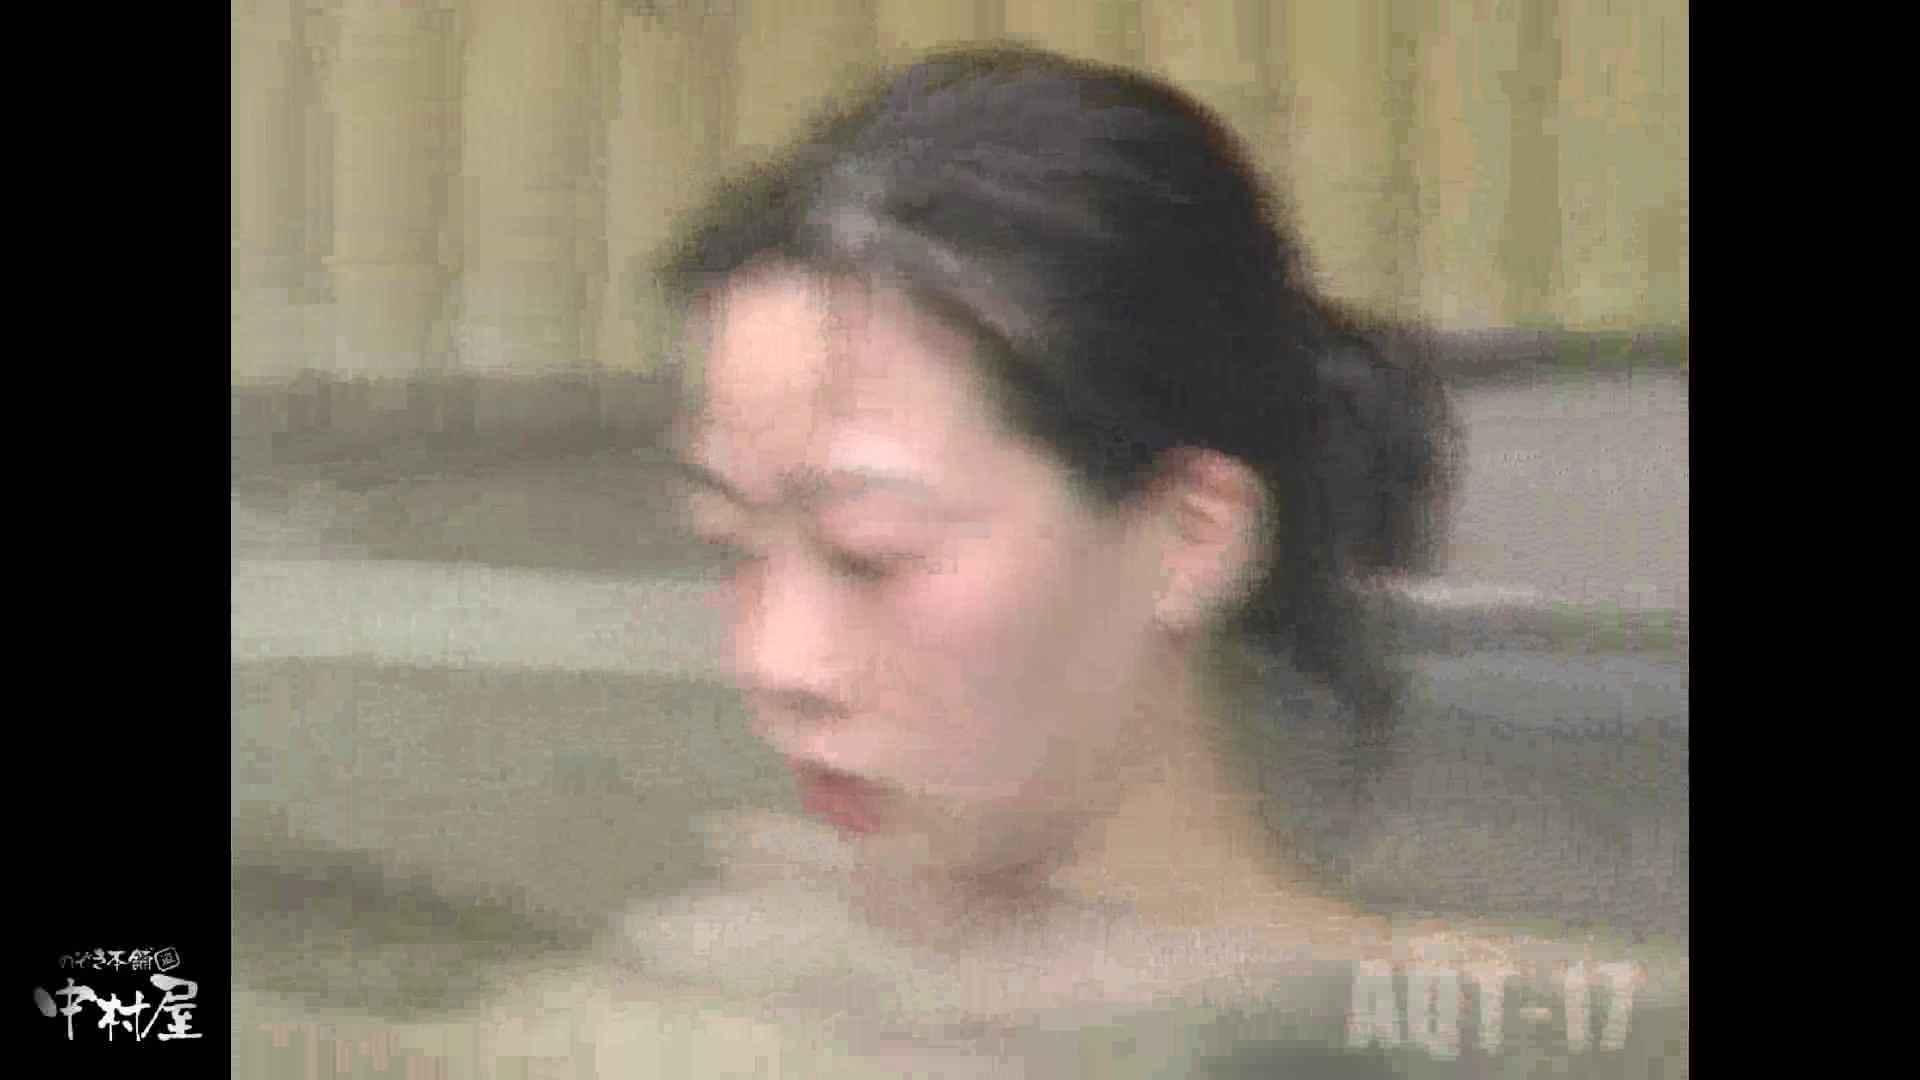 Aquaな露天風呂Vol.881潜入盗撮露天風呂十七判湯 其の一 盗撮特集   露天  68画像 65